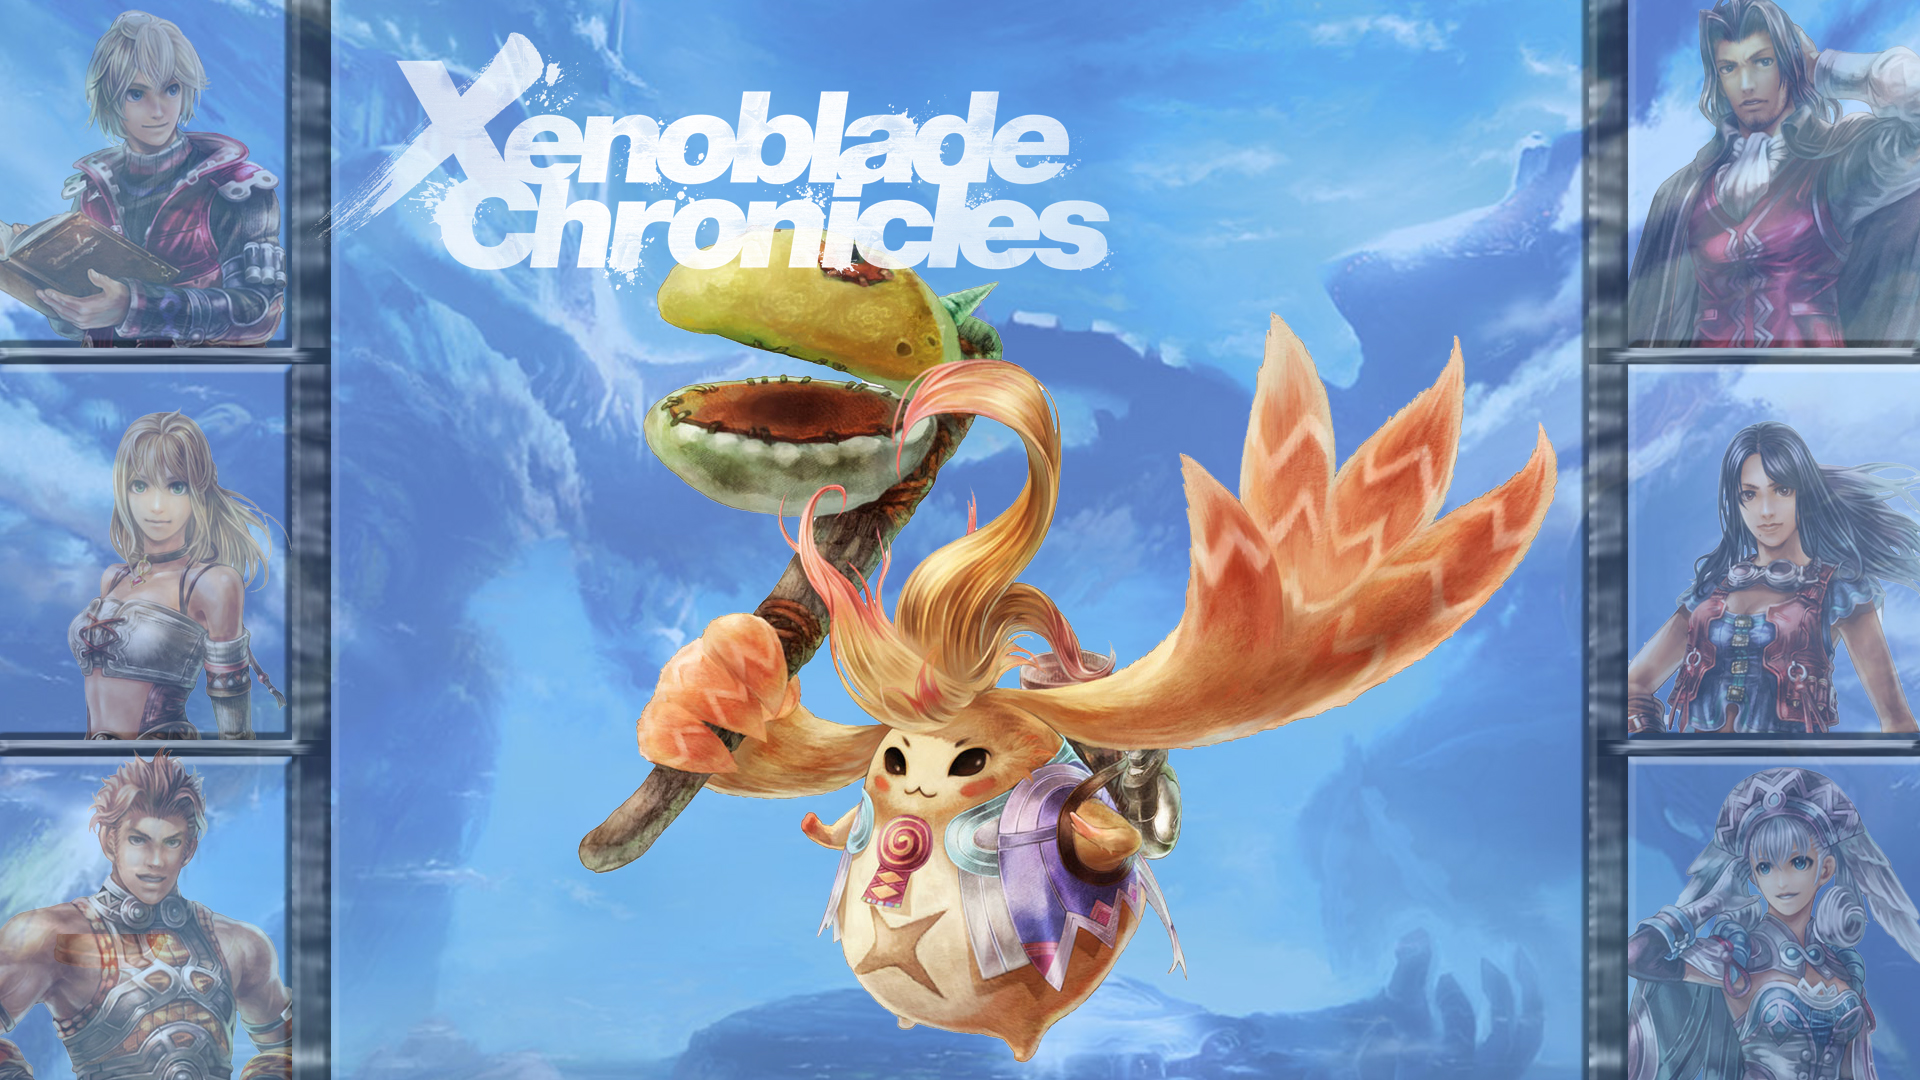 Lucky 7 Xenoblade Chronicles Riki By Mrjechgo On Deviantart